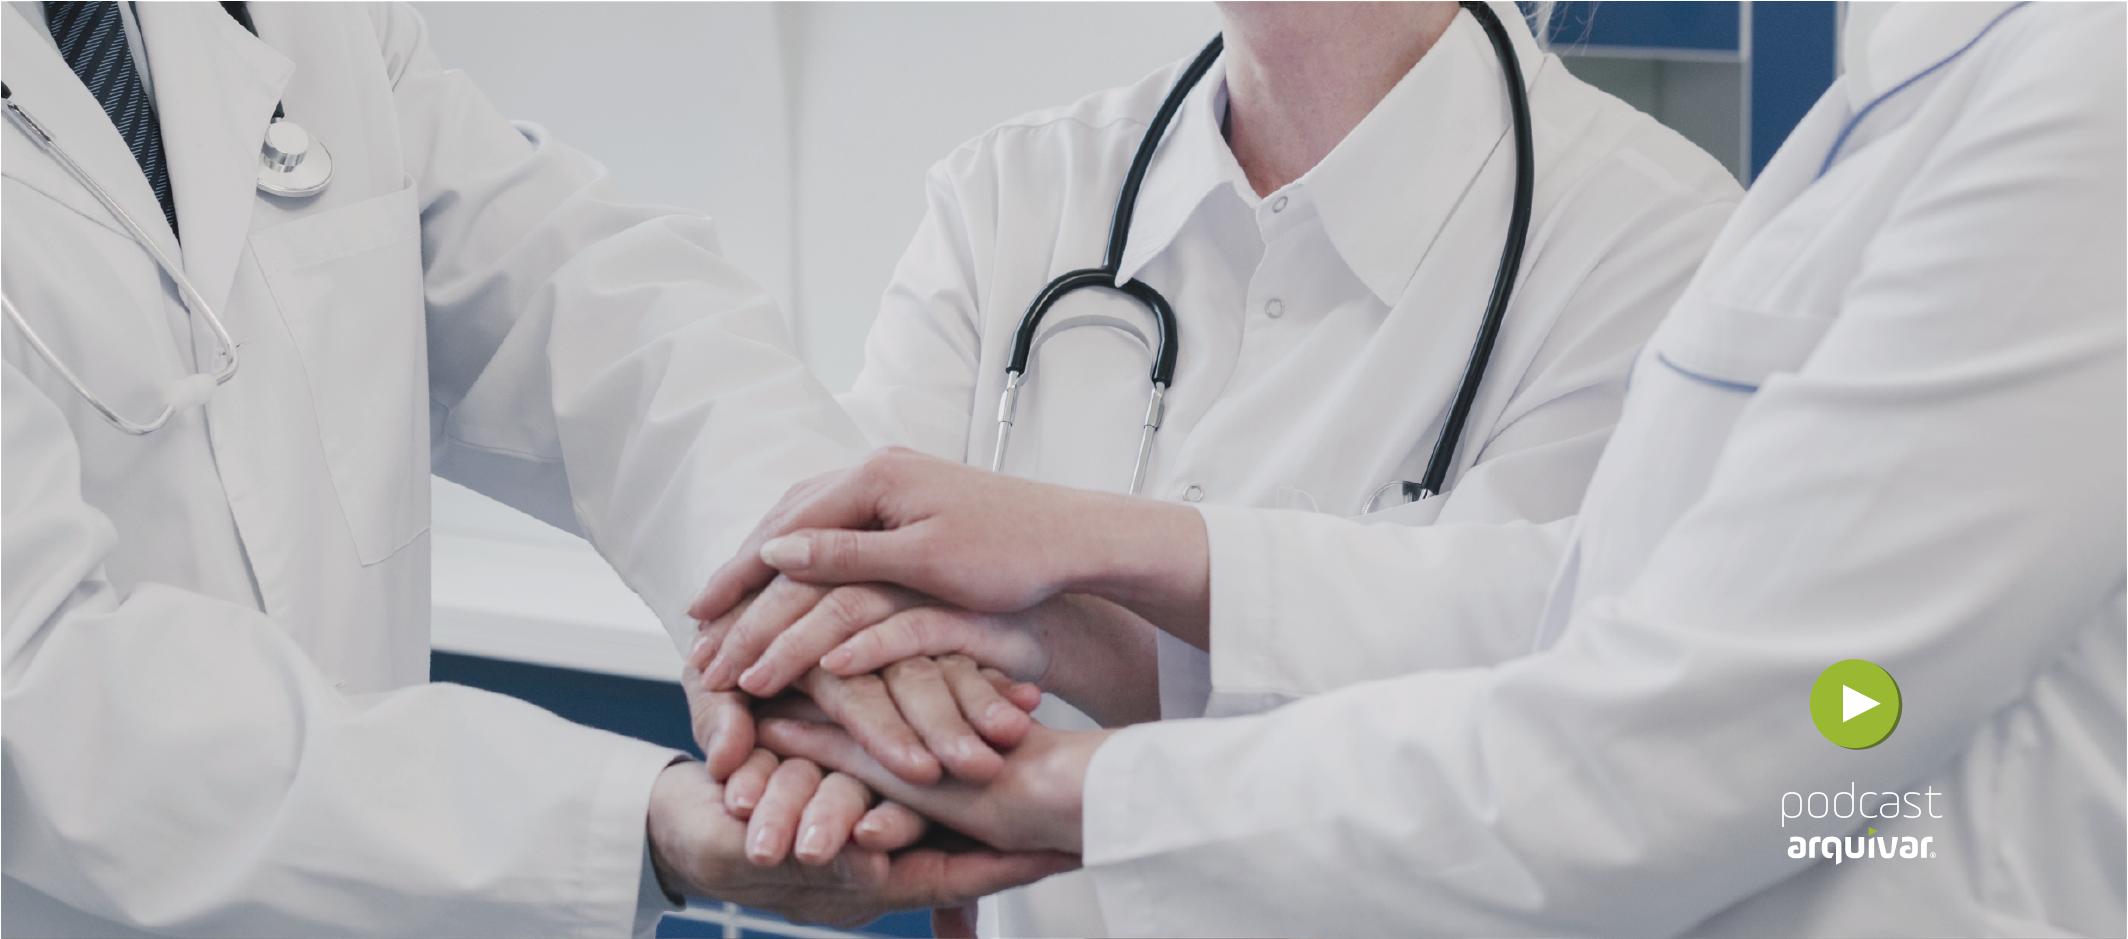 médicos unidos na cooperativa